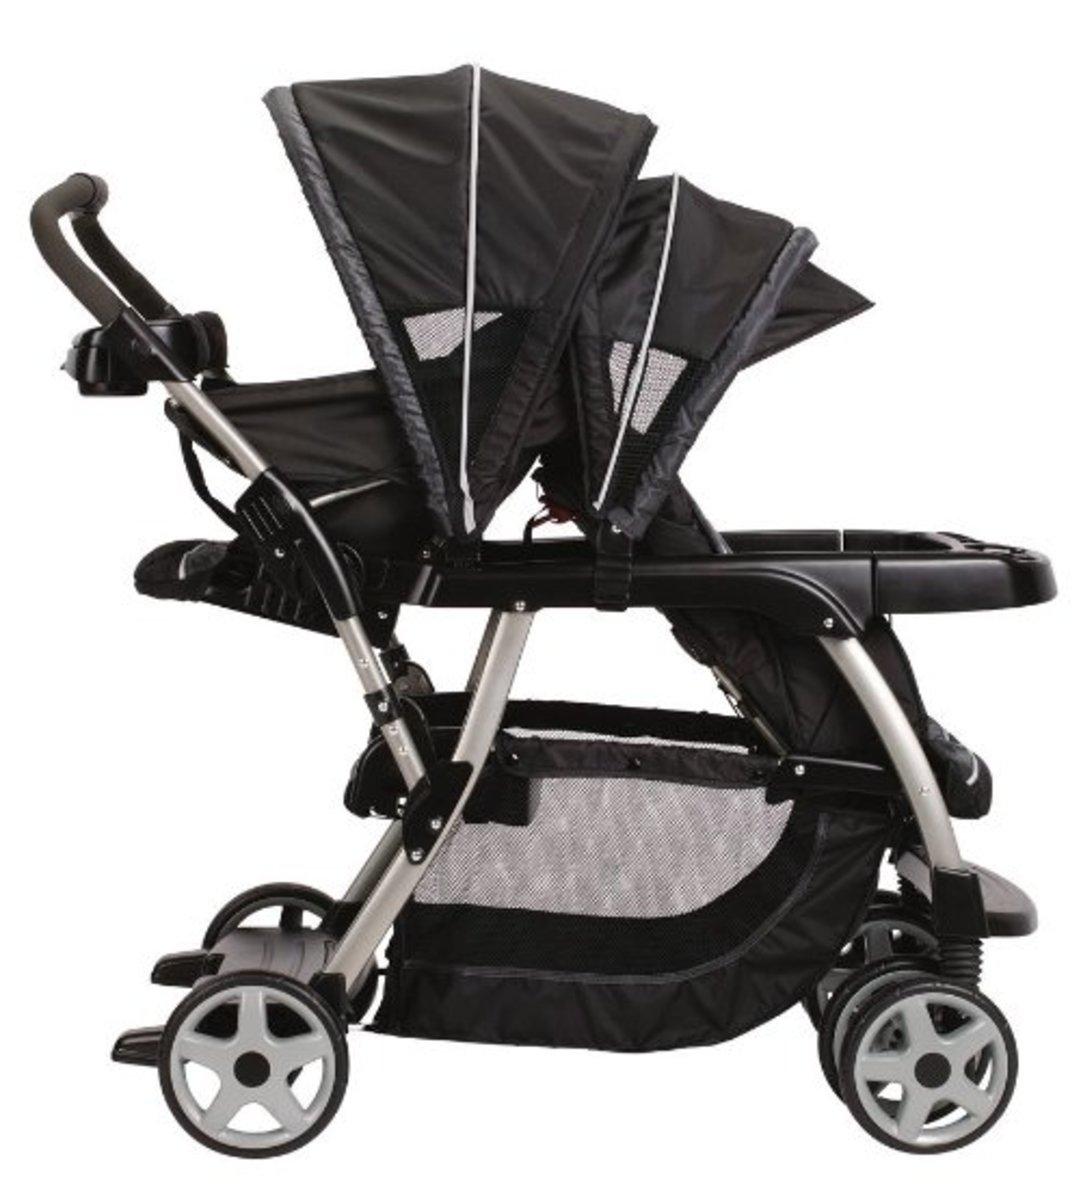 best sit and stand stroller 2015 reviews. Black Bedroom Furniture Sets. Home Design Ideas